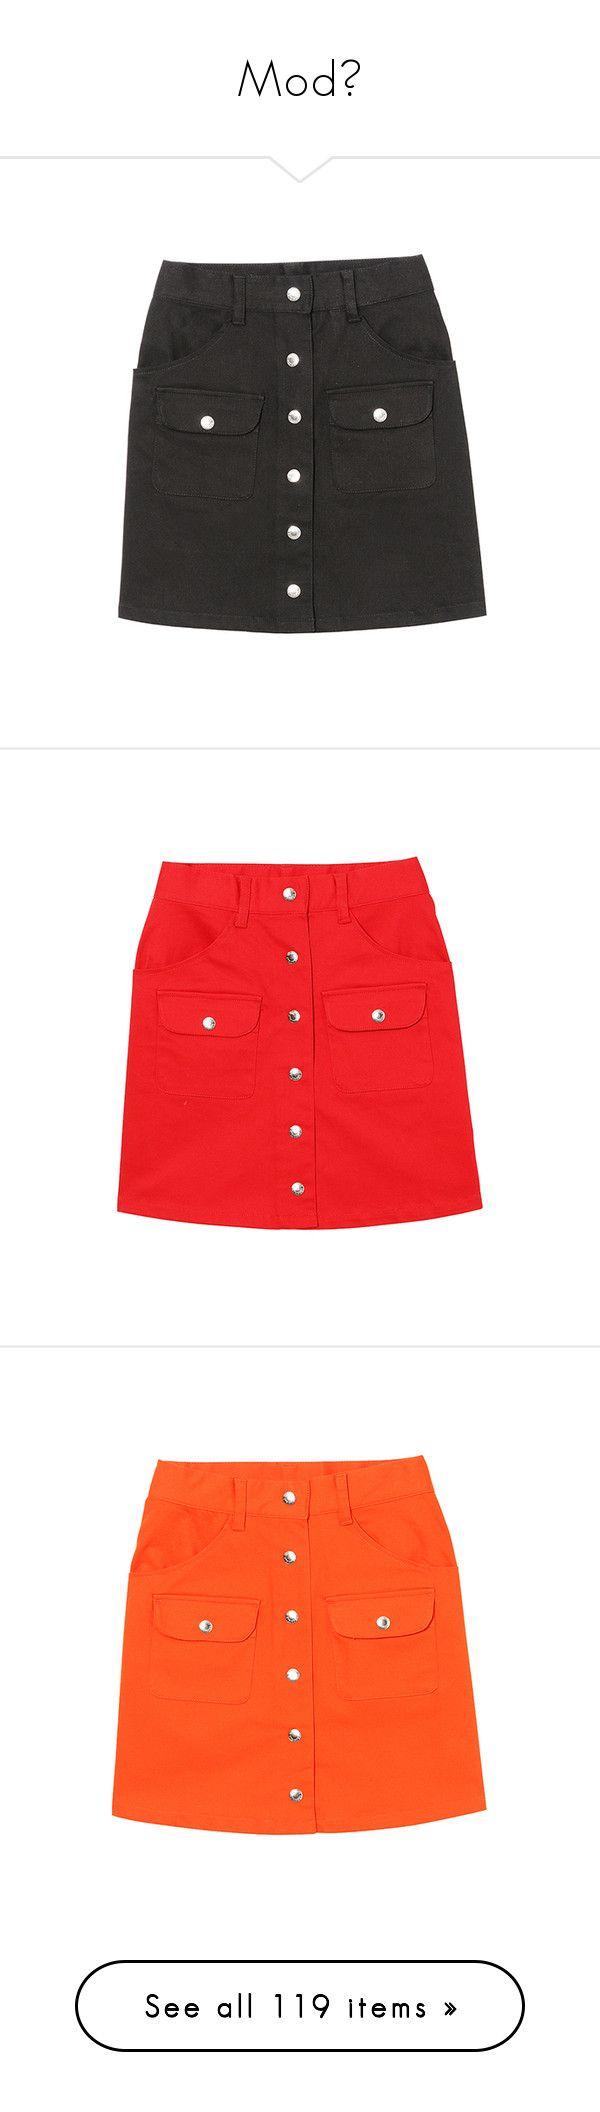 """Modę"" by nataliastopczasu ❤ liked on Polyvore featuring skirts, puff skirt, puffy skirts, red puffy skirt, red knee length skirt, red skirt, orange skirt, yellow skirts, mini skirts and blue sequin mini skirt"